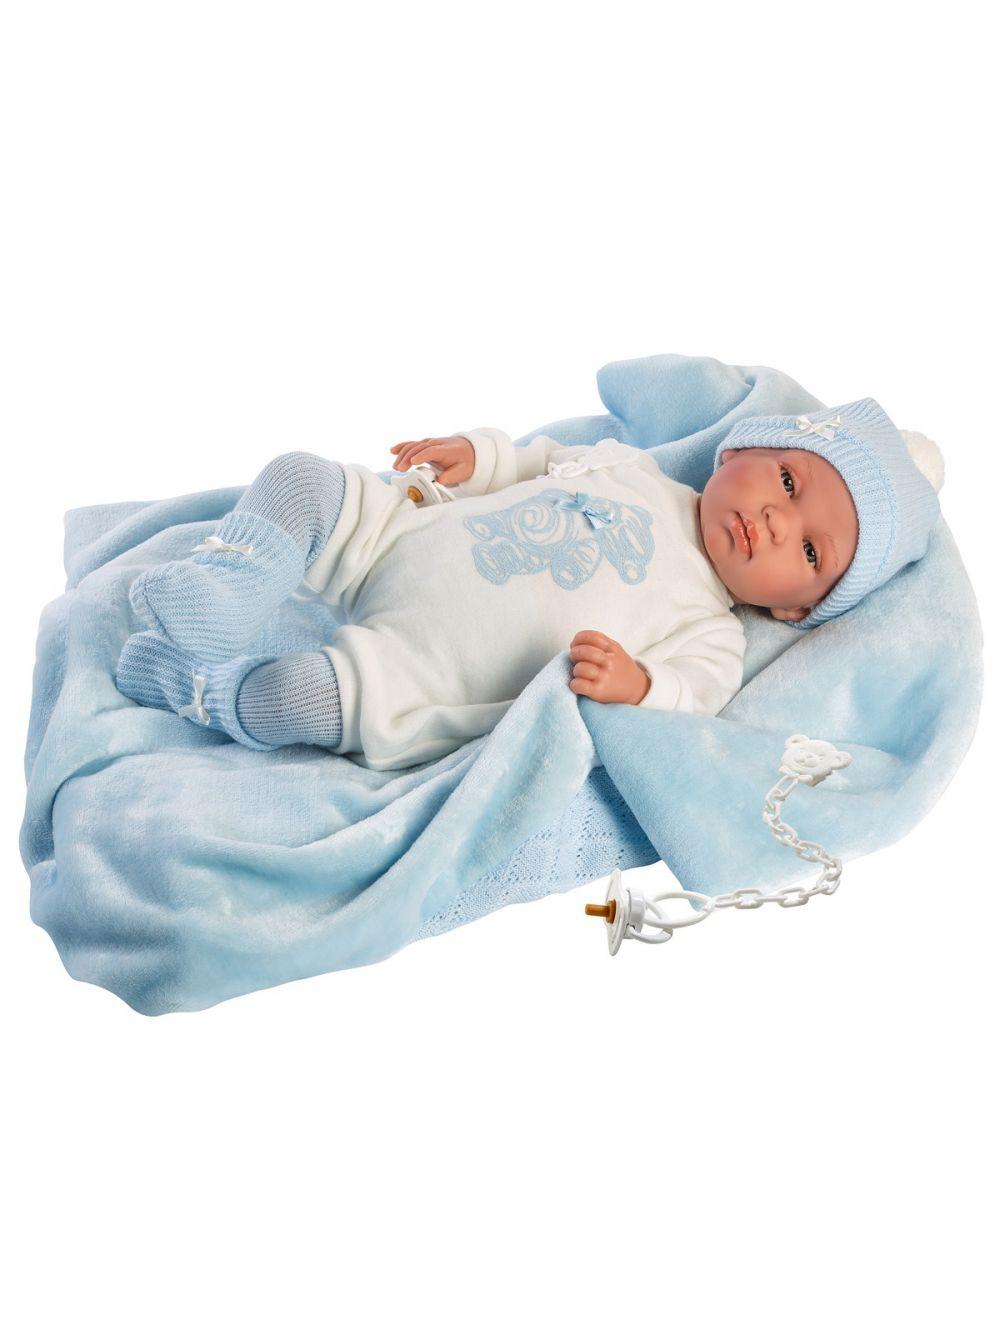 Llorens 84427 Lalka płacząca bobas Tino 43 cm body niebieski miś